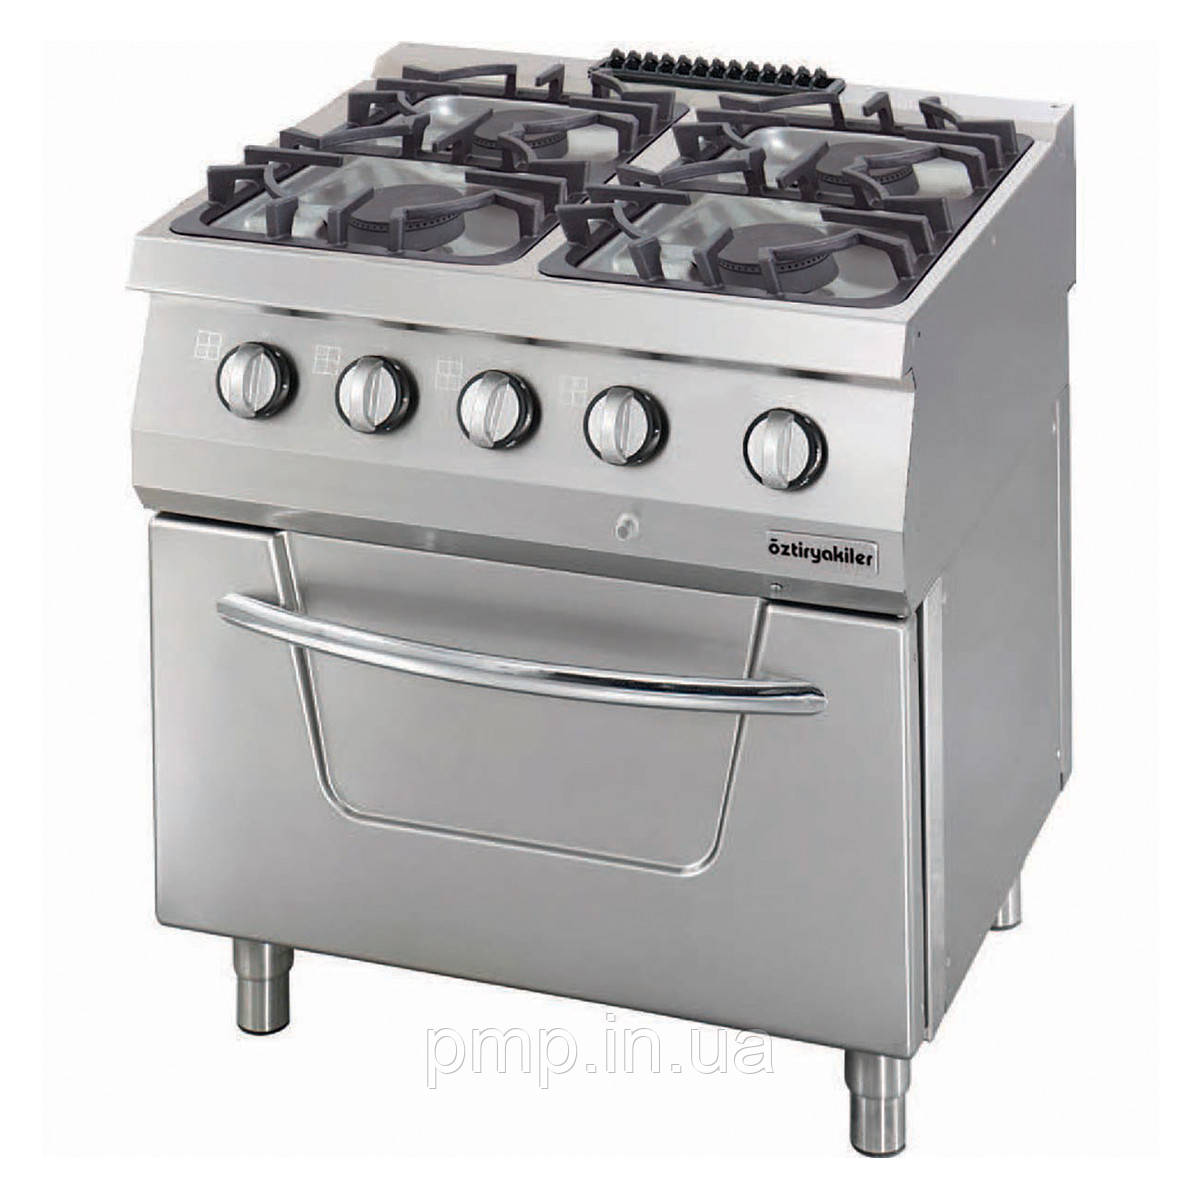 Газовая плита с духовкой Ozti OSOGF 8070 LS c 4 конфорками